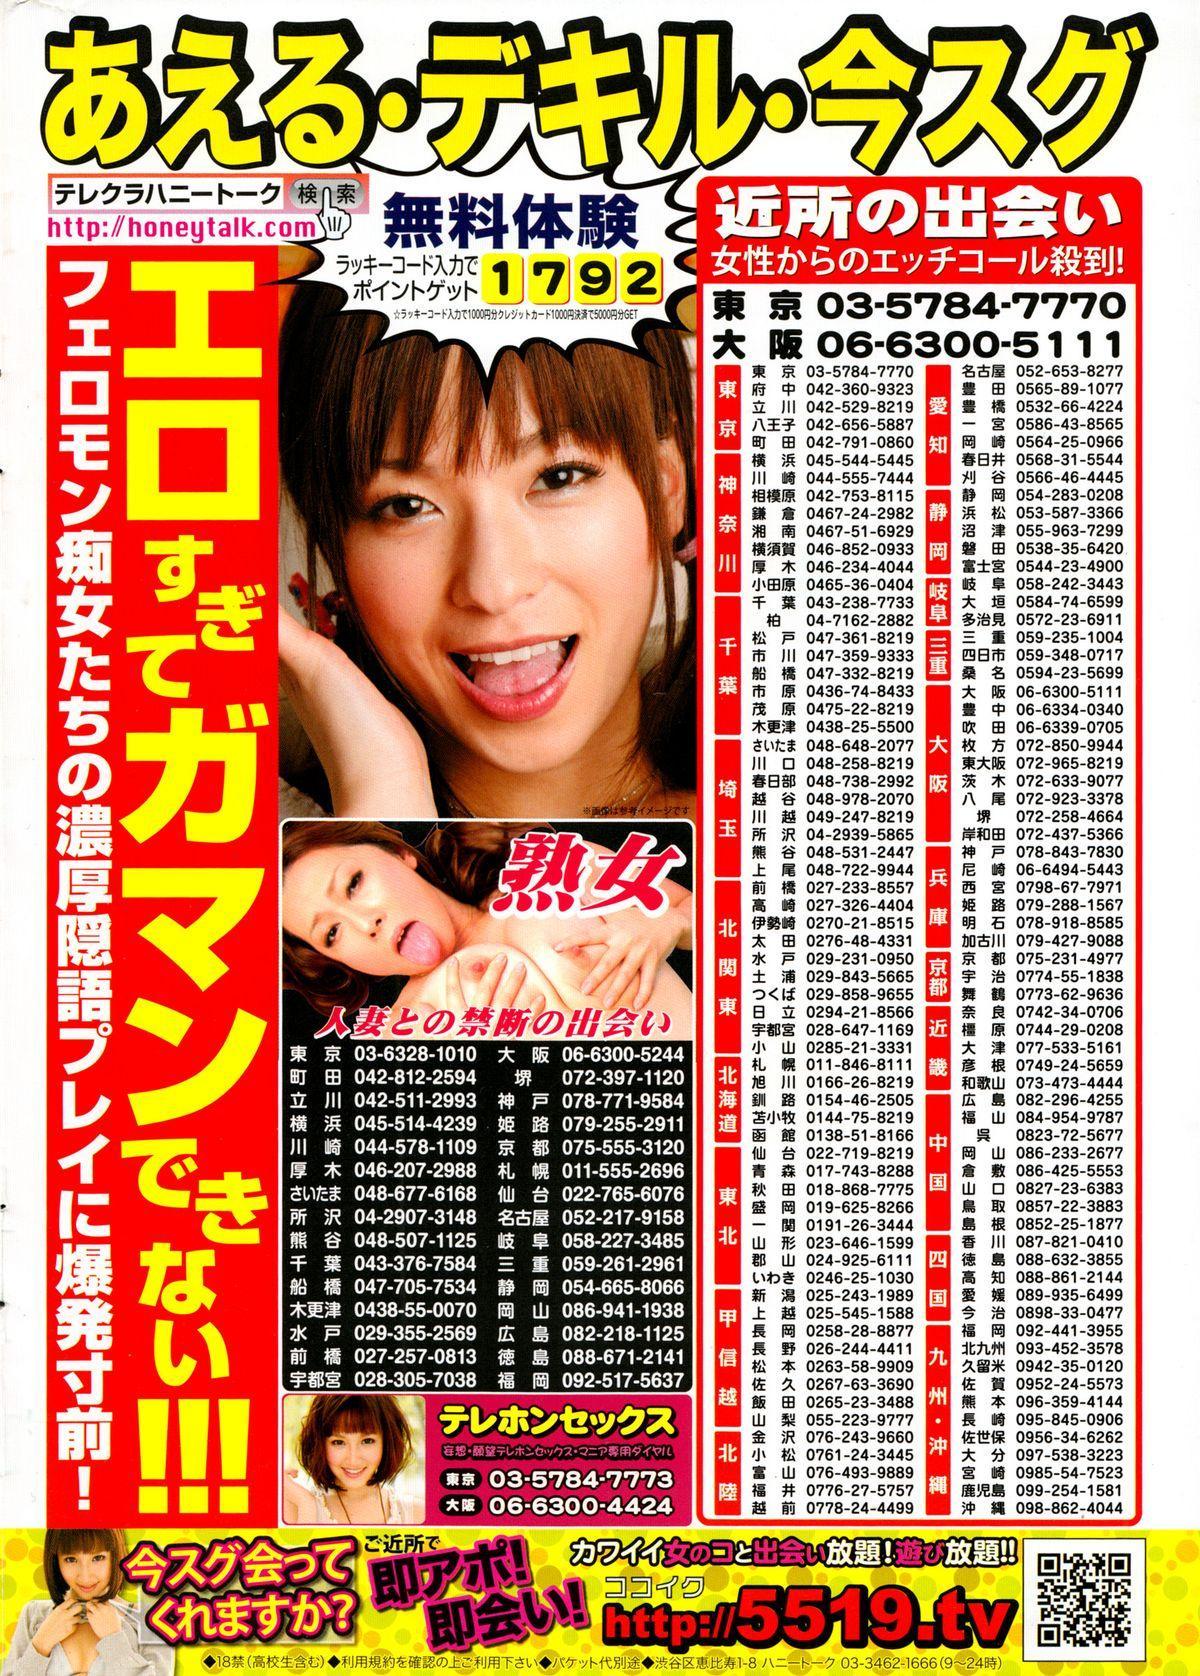 COMIC Penguin Club Sanzokuban 2014-12 1